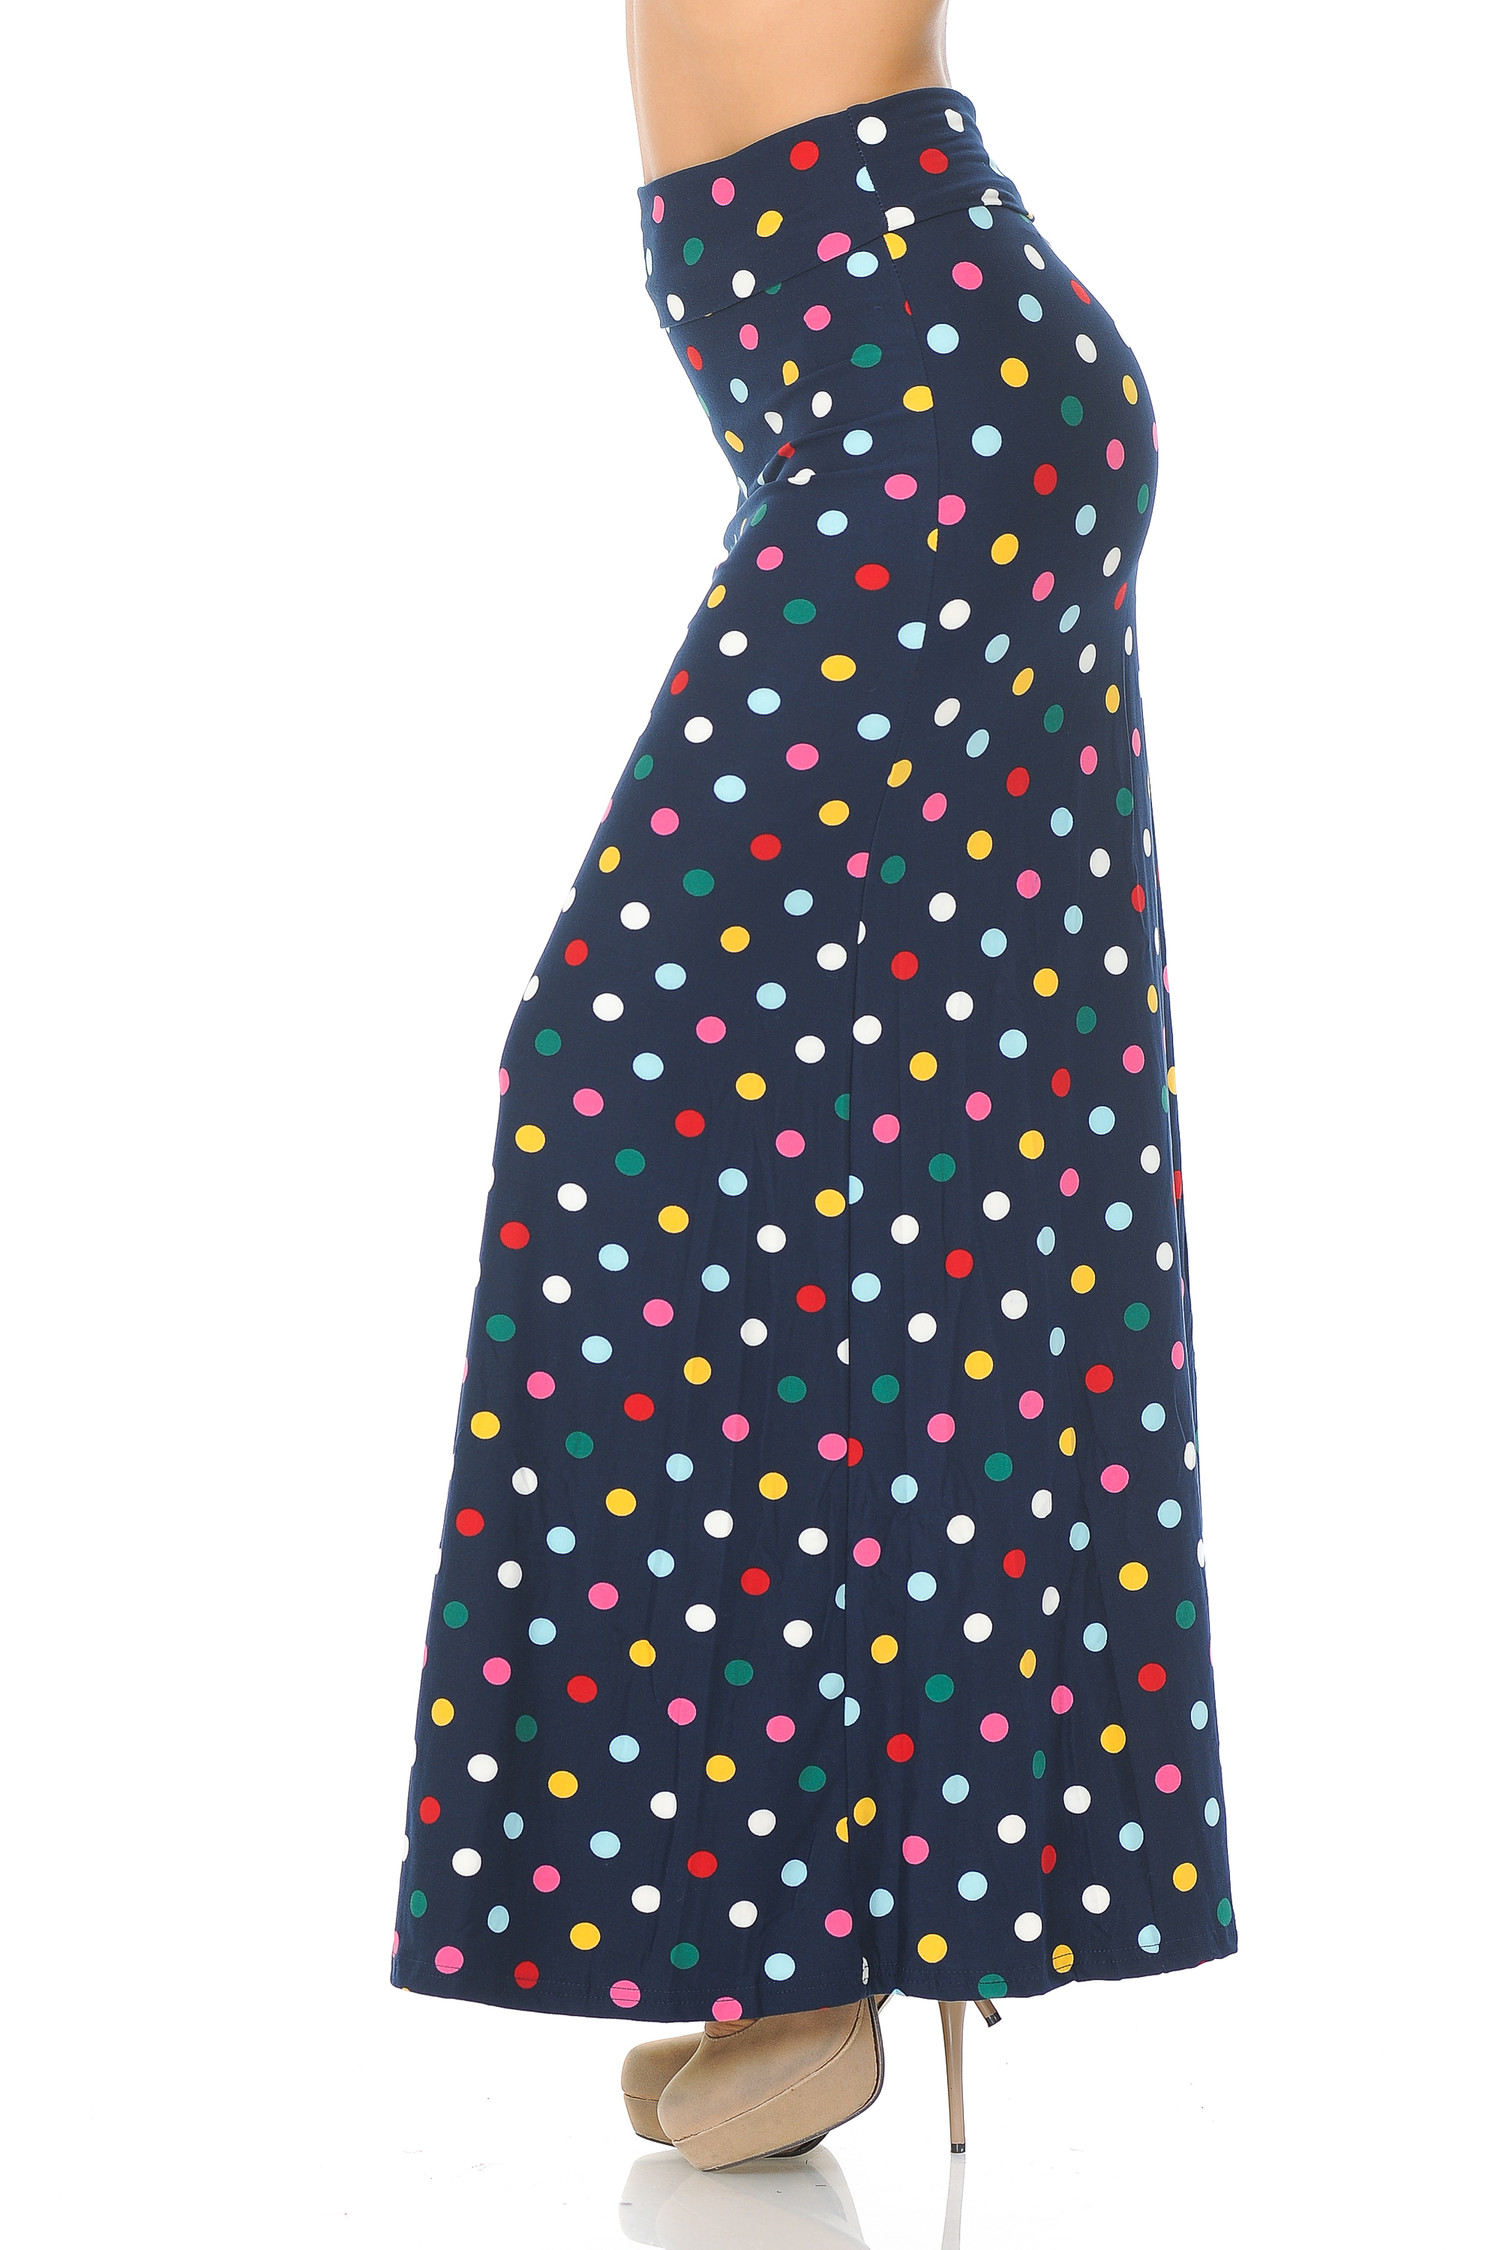 Brushed Colorful Polka Dot Maxi Skirt